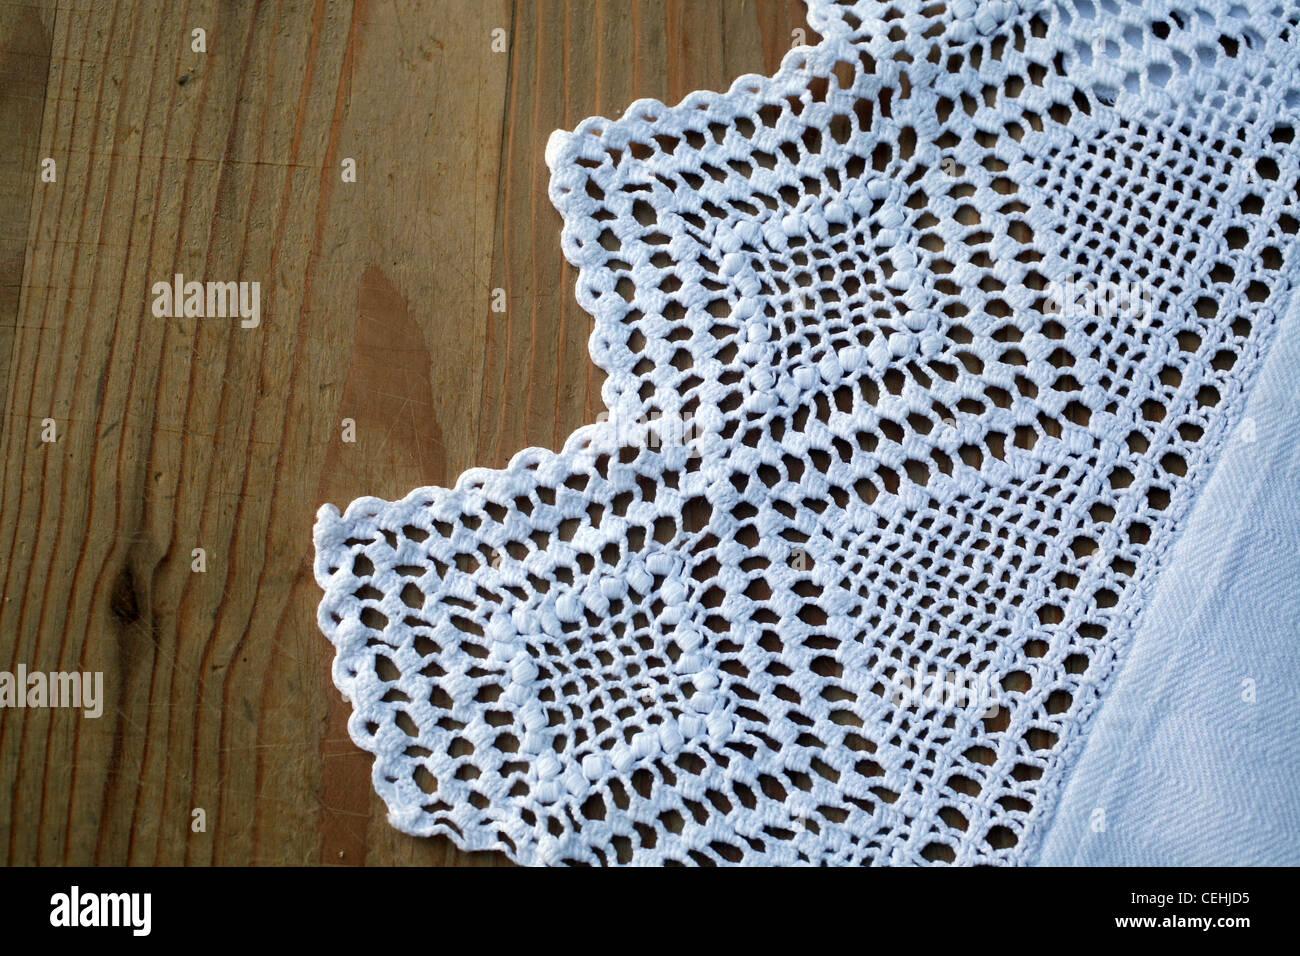 Crochet Tablecloth Stock Photos & Crochet Tablecloth Stock Images ...